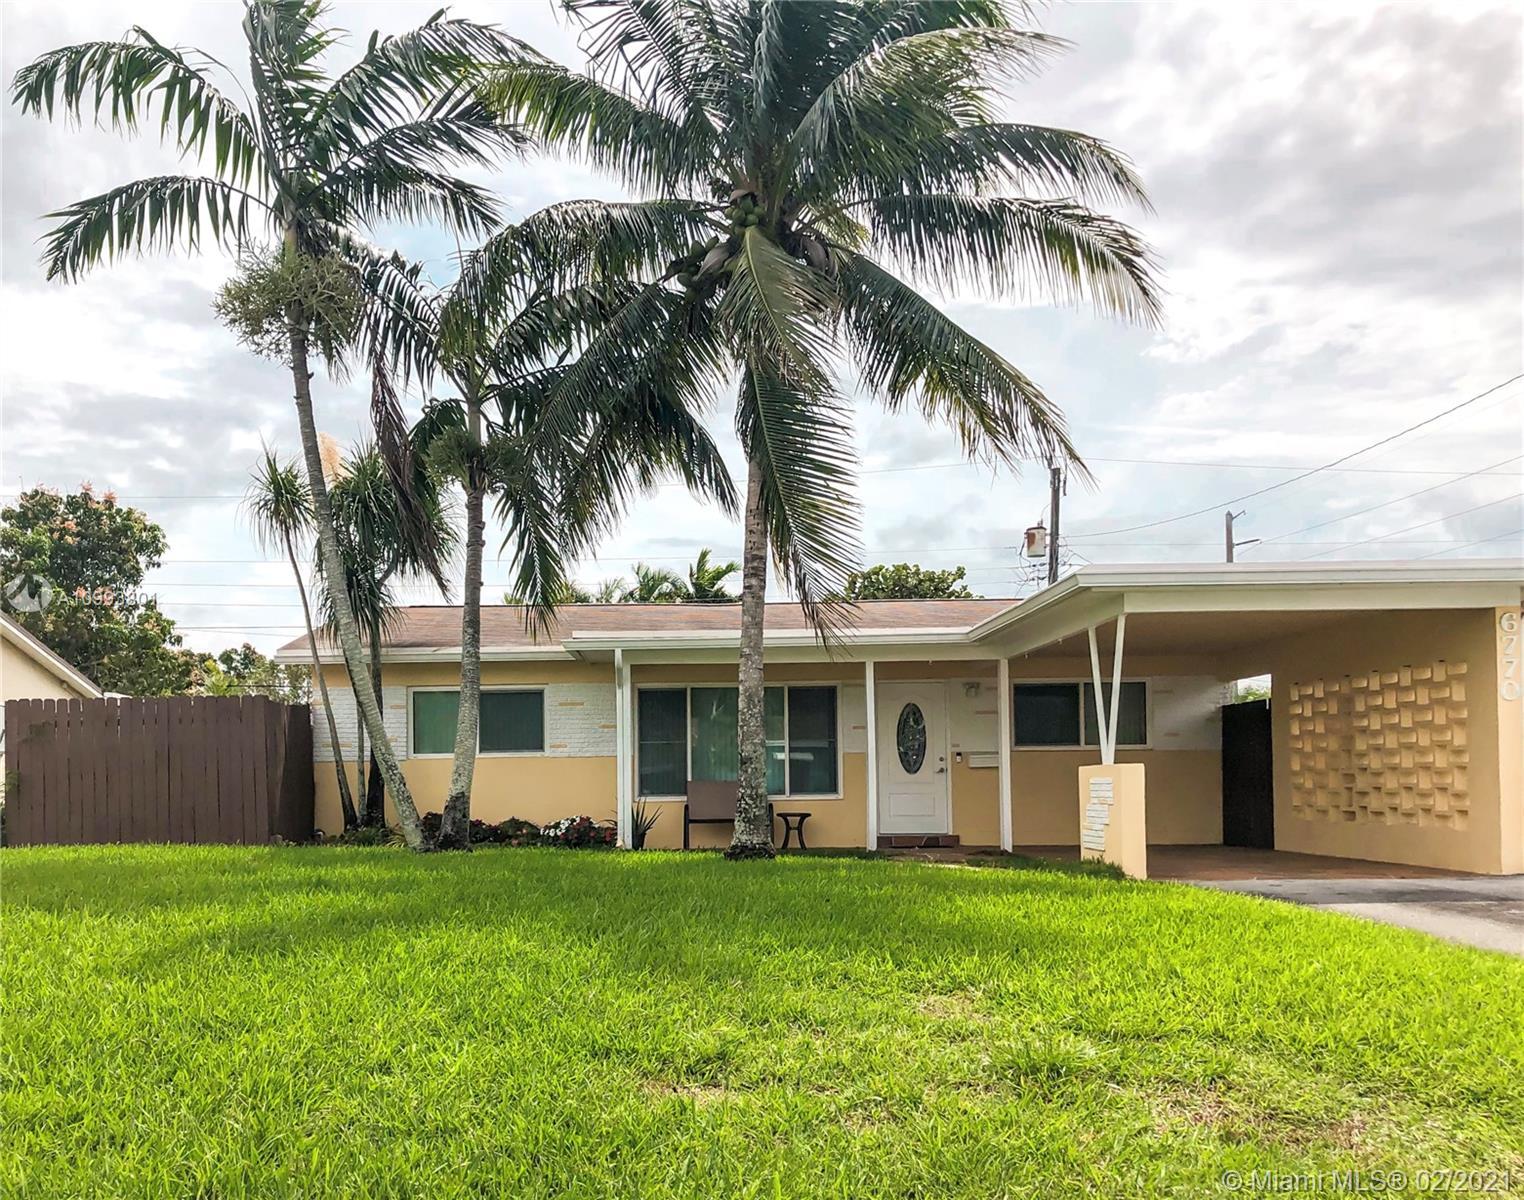 Driftwood Acres, 6770 Pershing St, Hollywood, Florida 33024